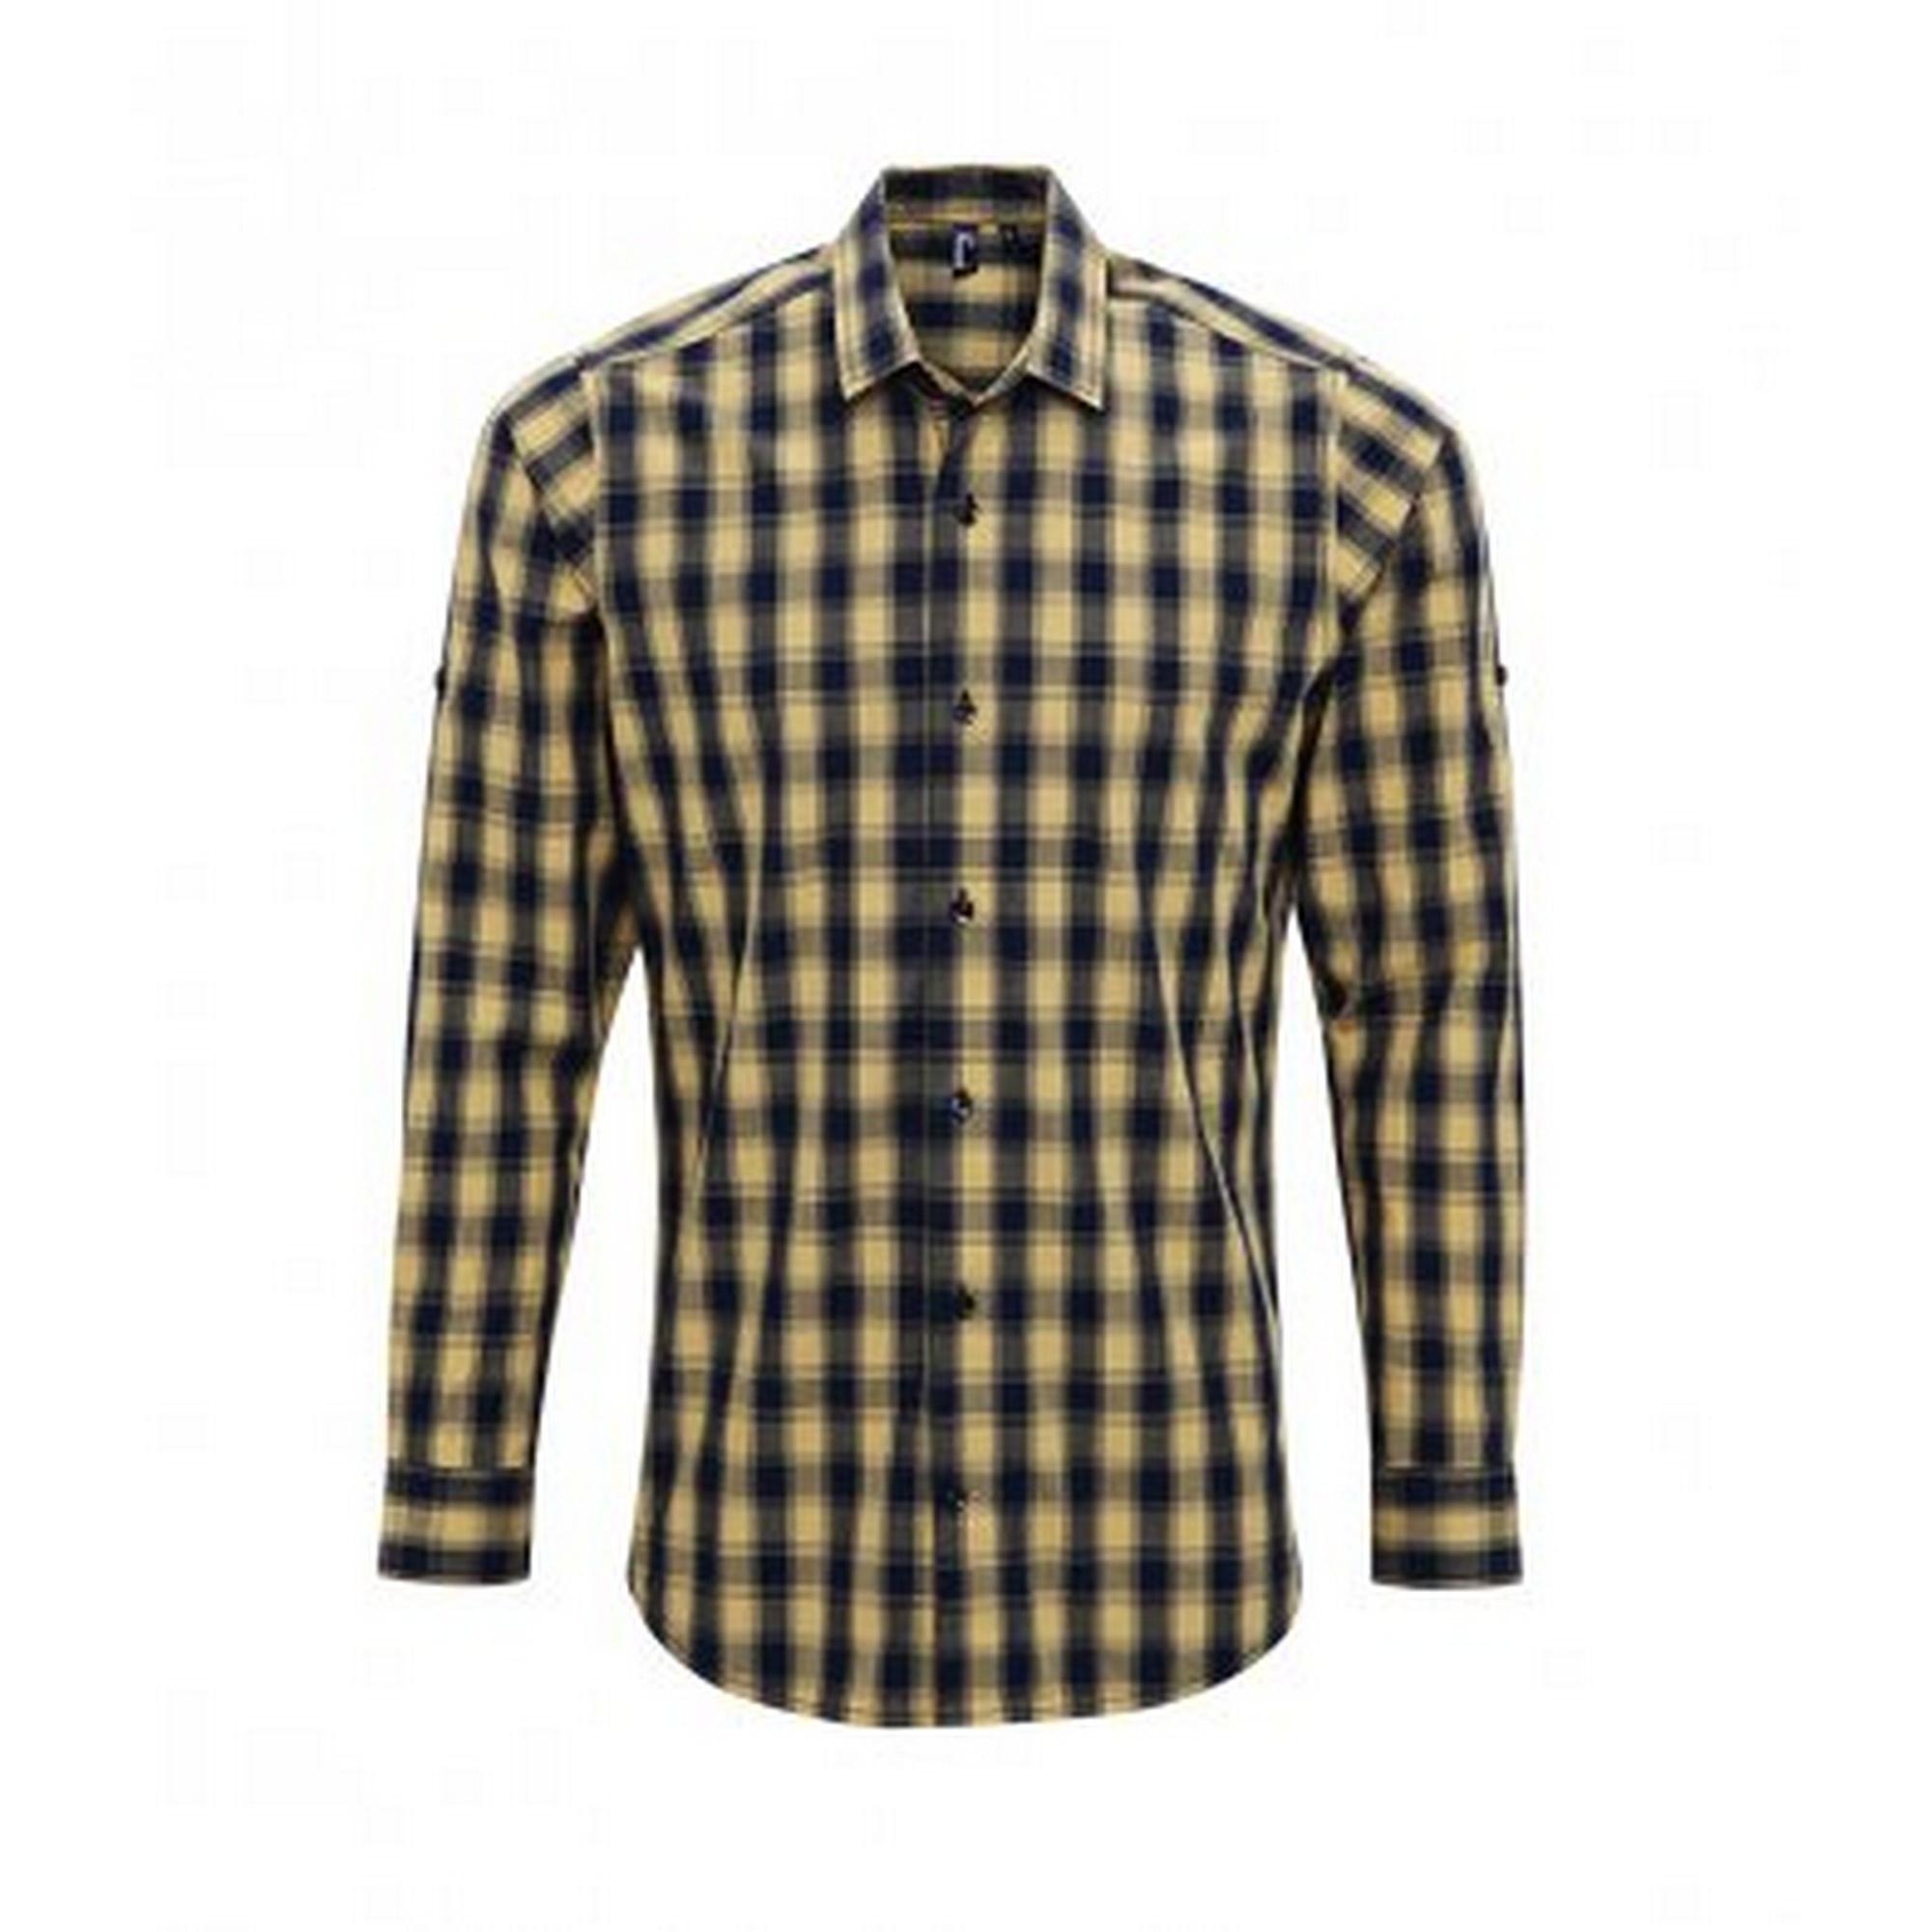 Premier Mens Mulligan Check Long Sleeve Shirt (S) (Camel/Navy)